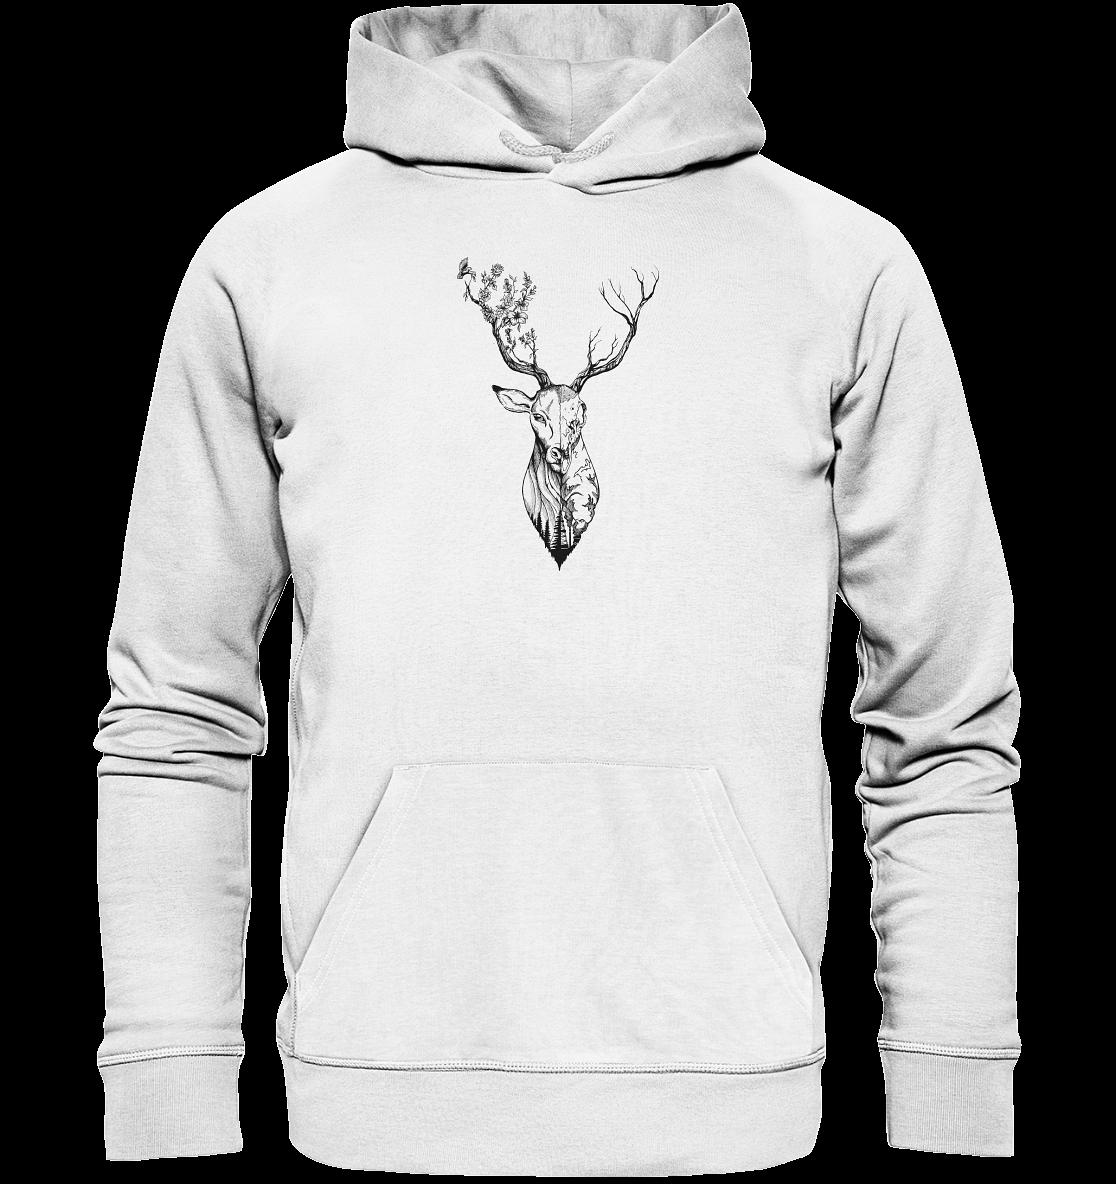 front-organic-hoodie-f8f8f8-1116x-8.png